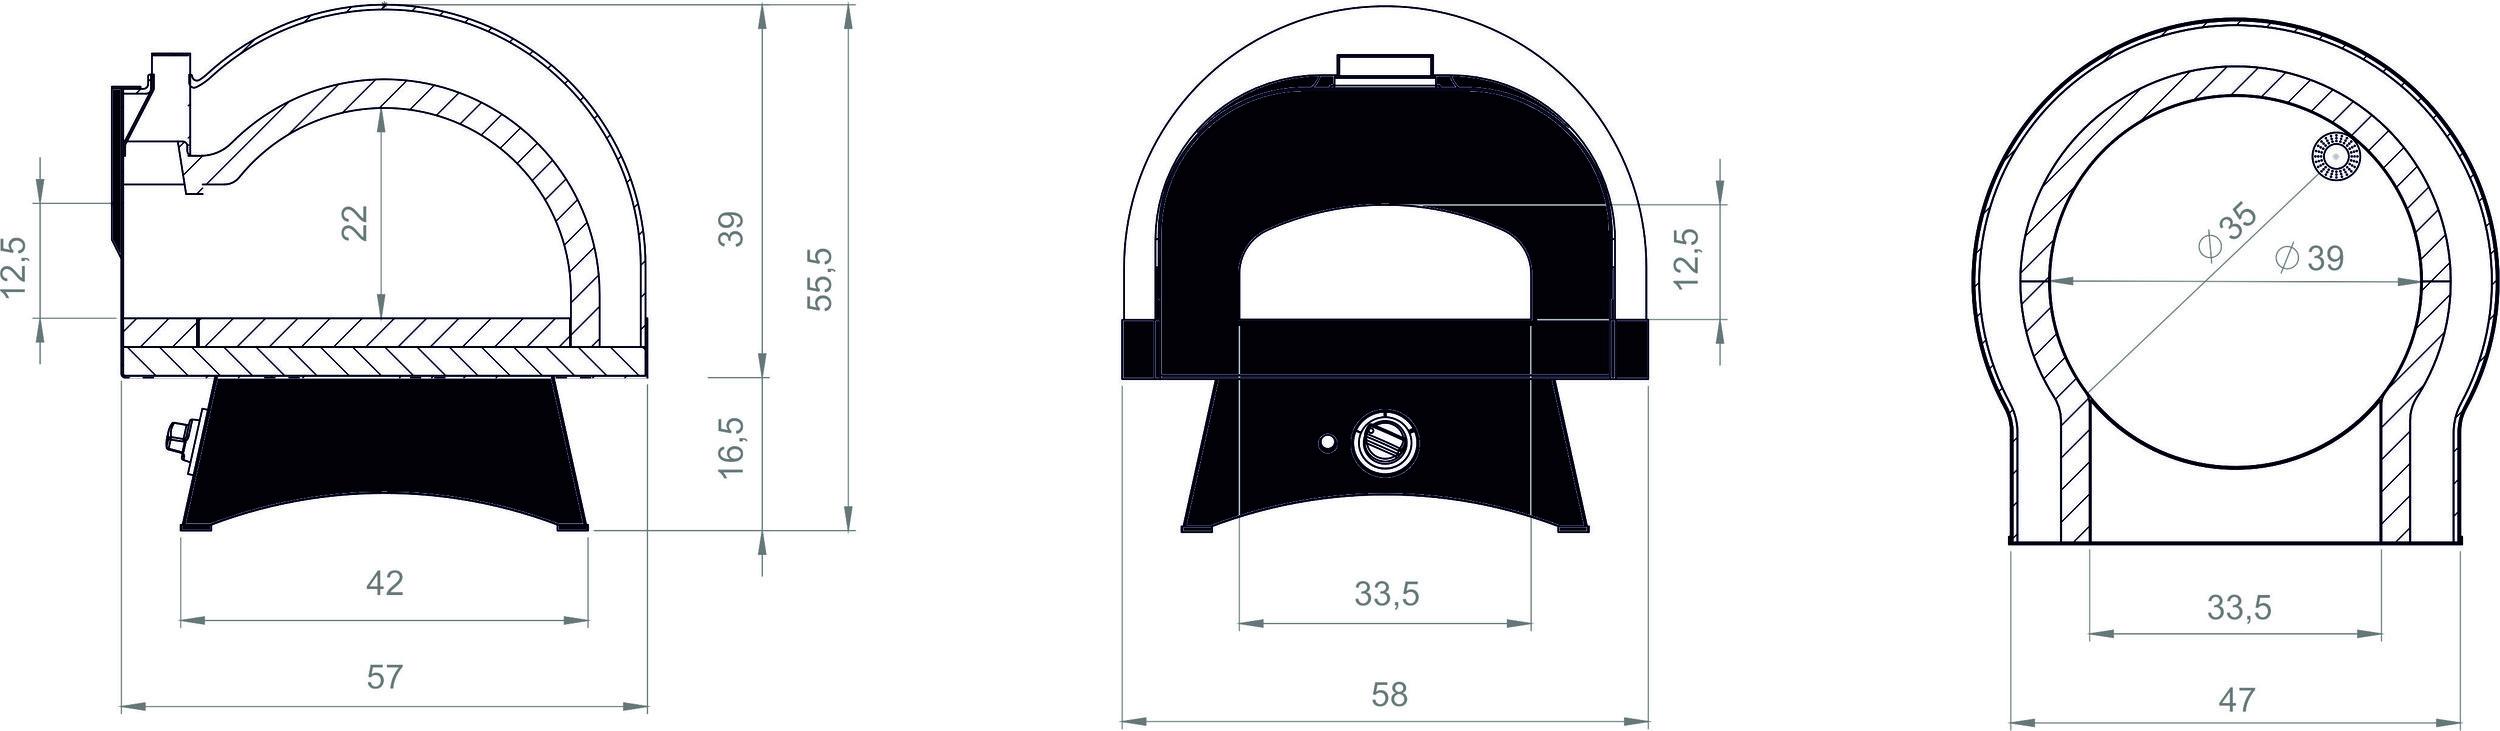 SC MINI Size.jpg